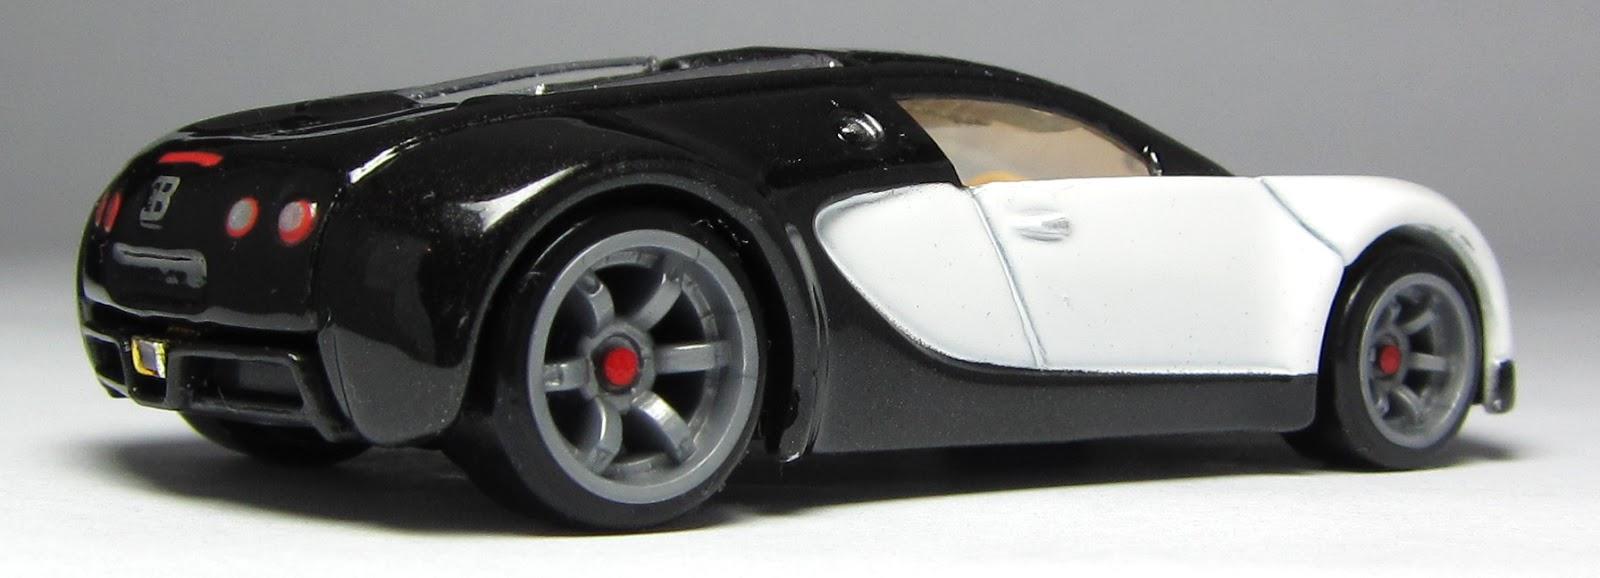 Model Of The Day Hot Wheels Speed Machines Bugatti Veyron